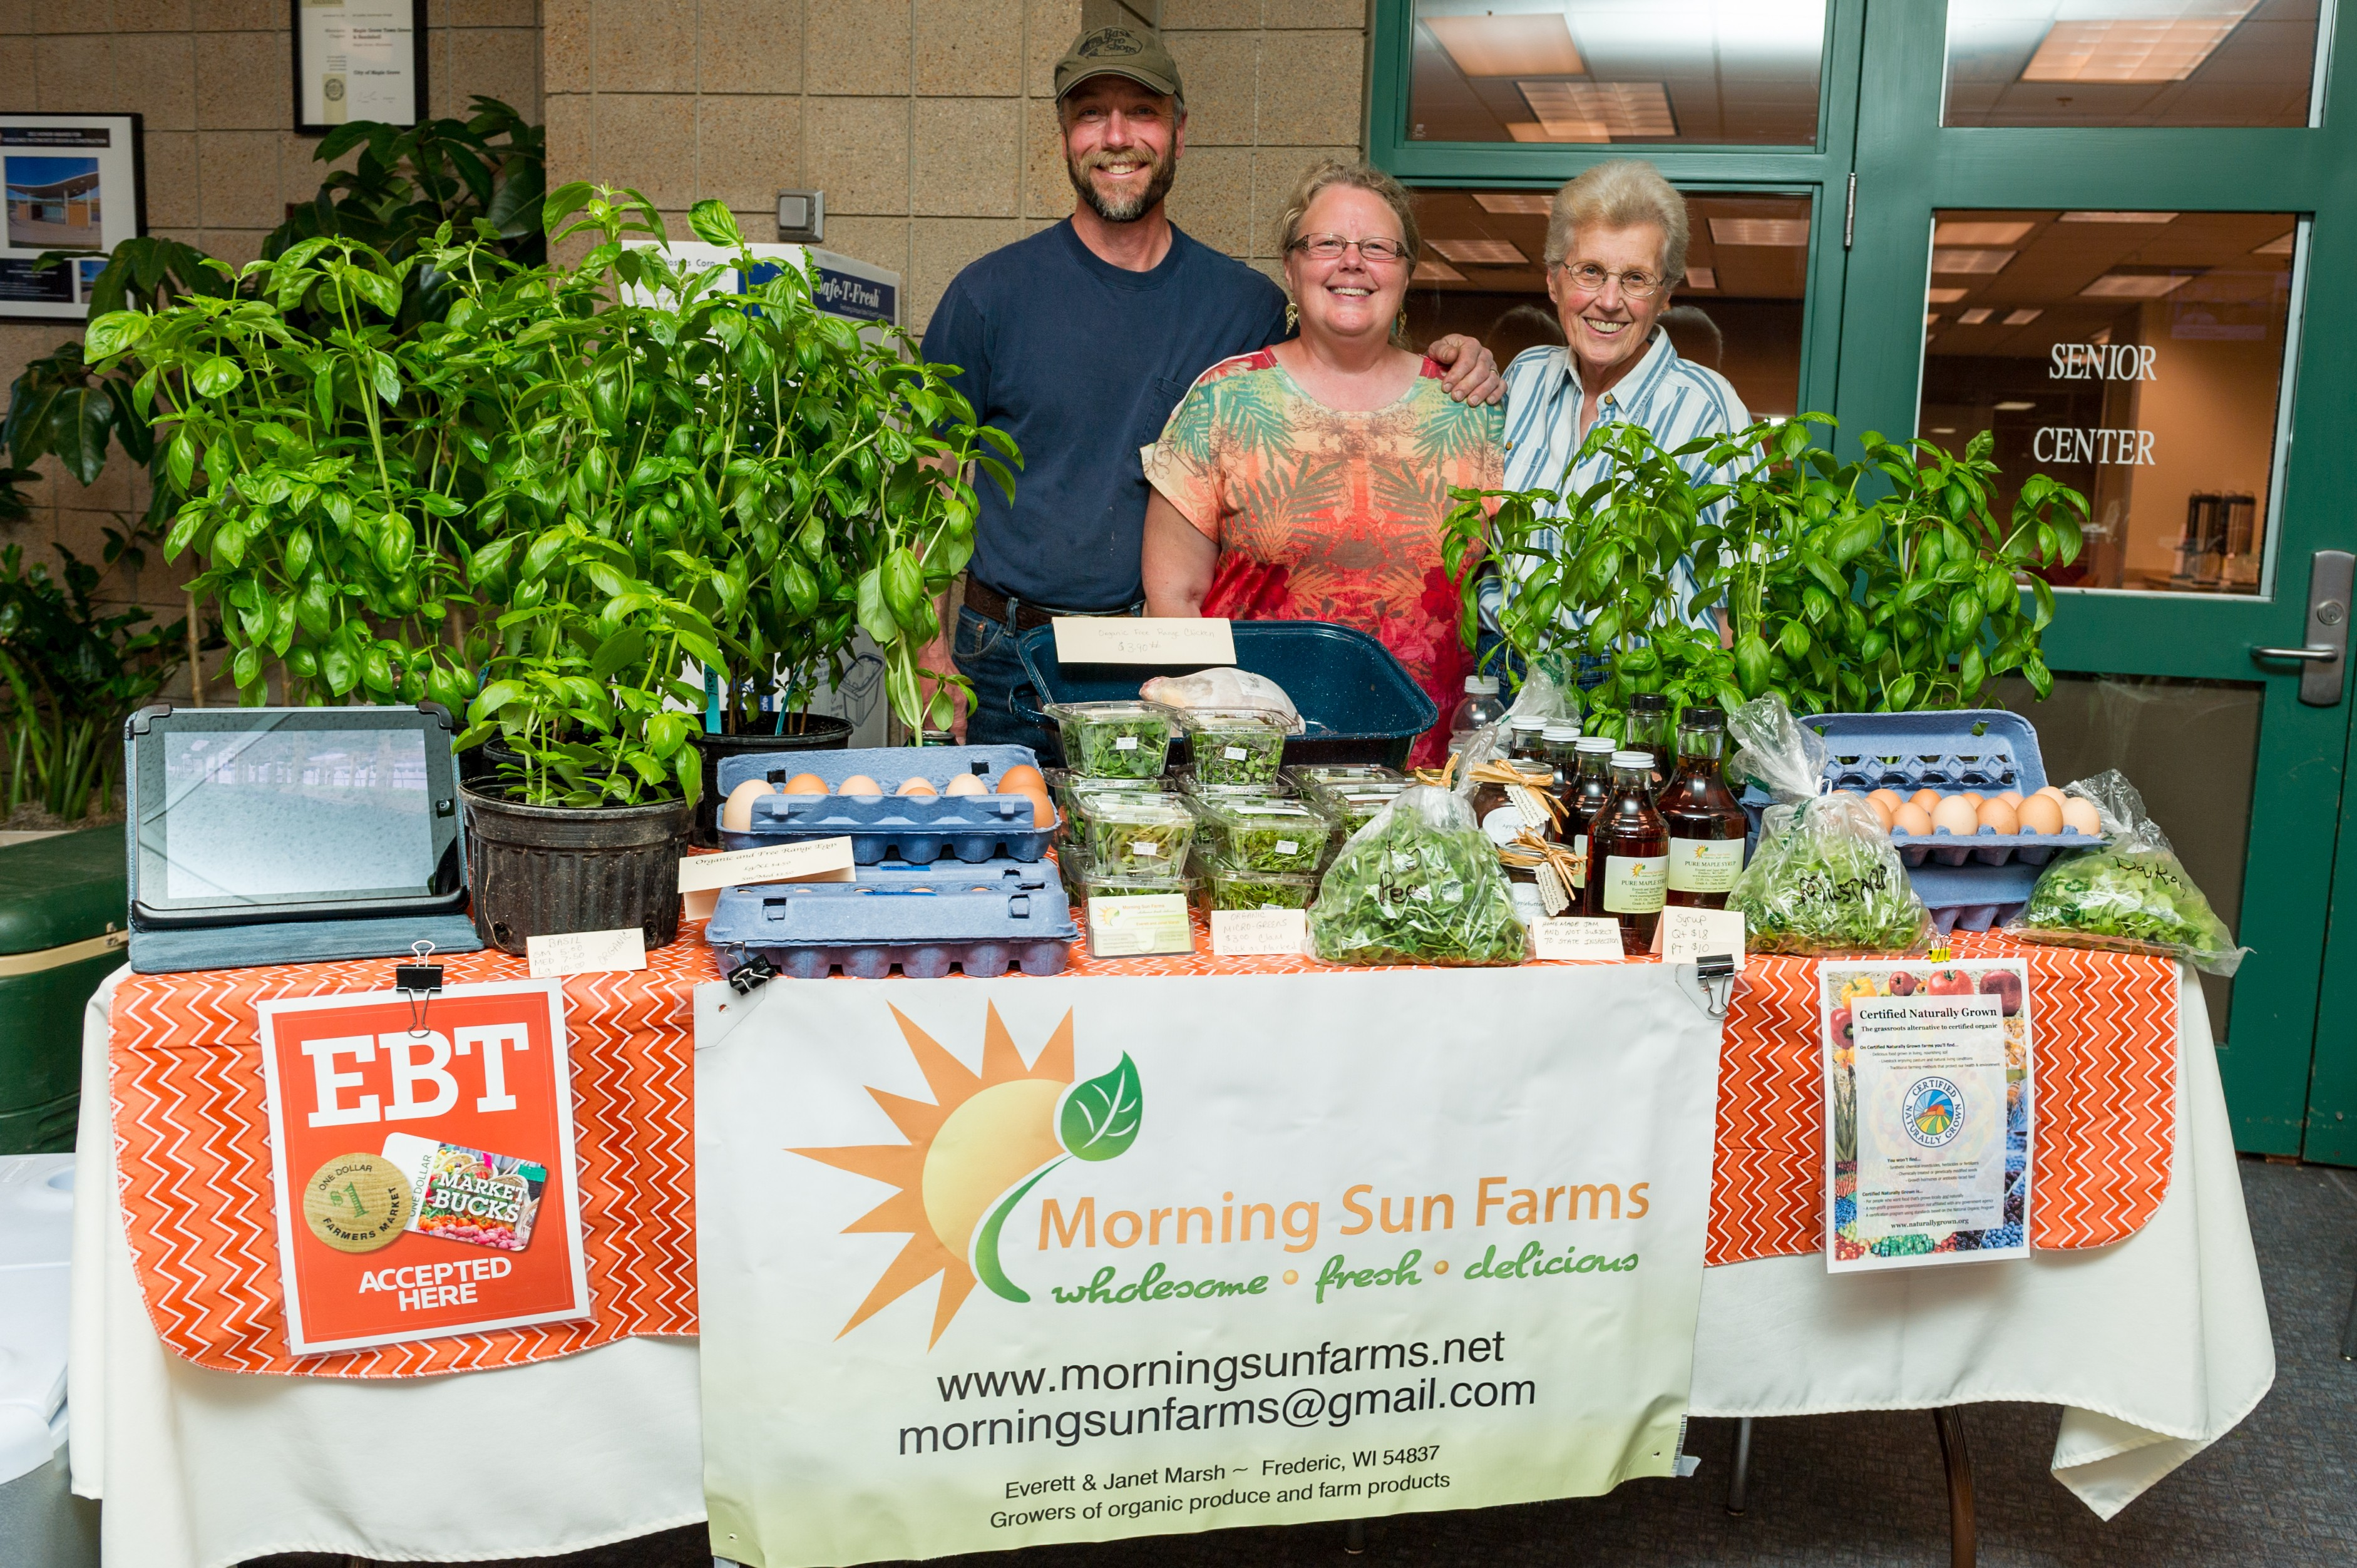 Farmers Market Began Its 2009 Season >> Meet Our Vendors Locally Grown Maple Grove Farmers Market